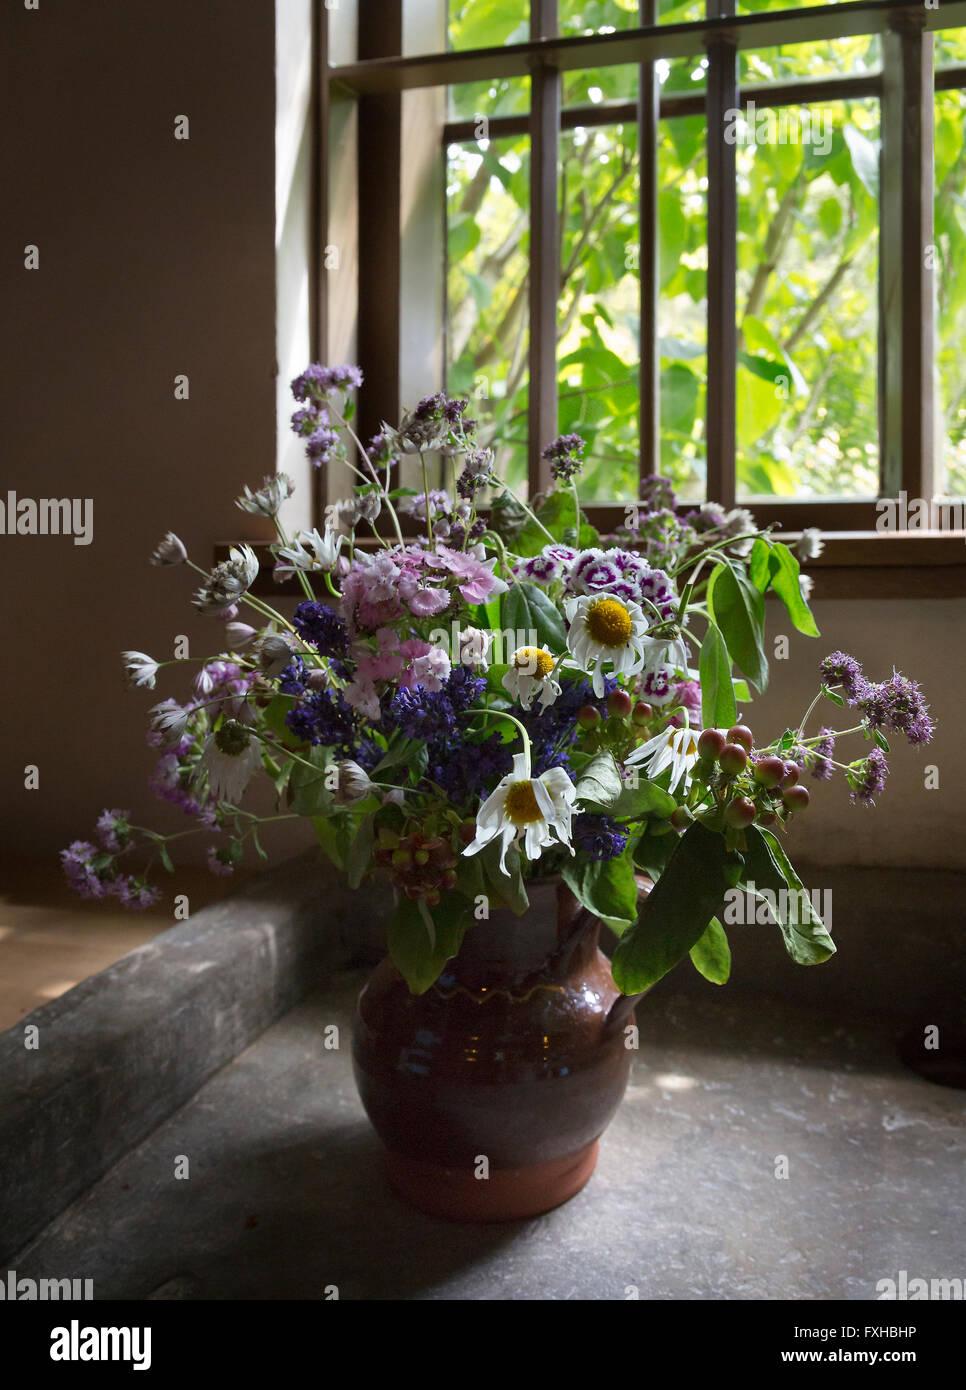 Cut flowers. - Stock Image